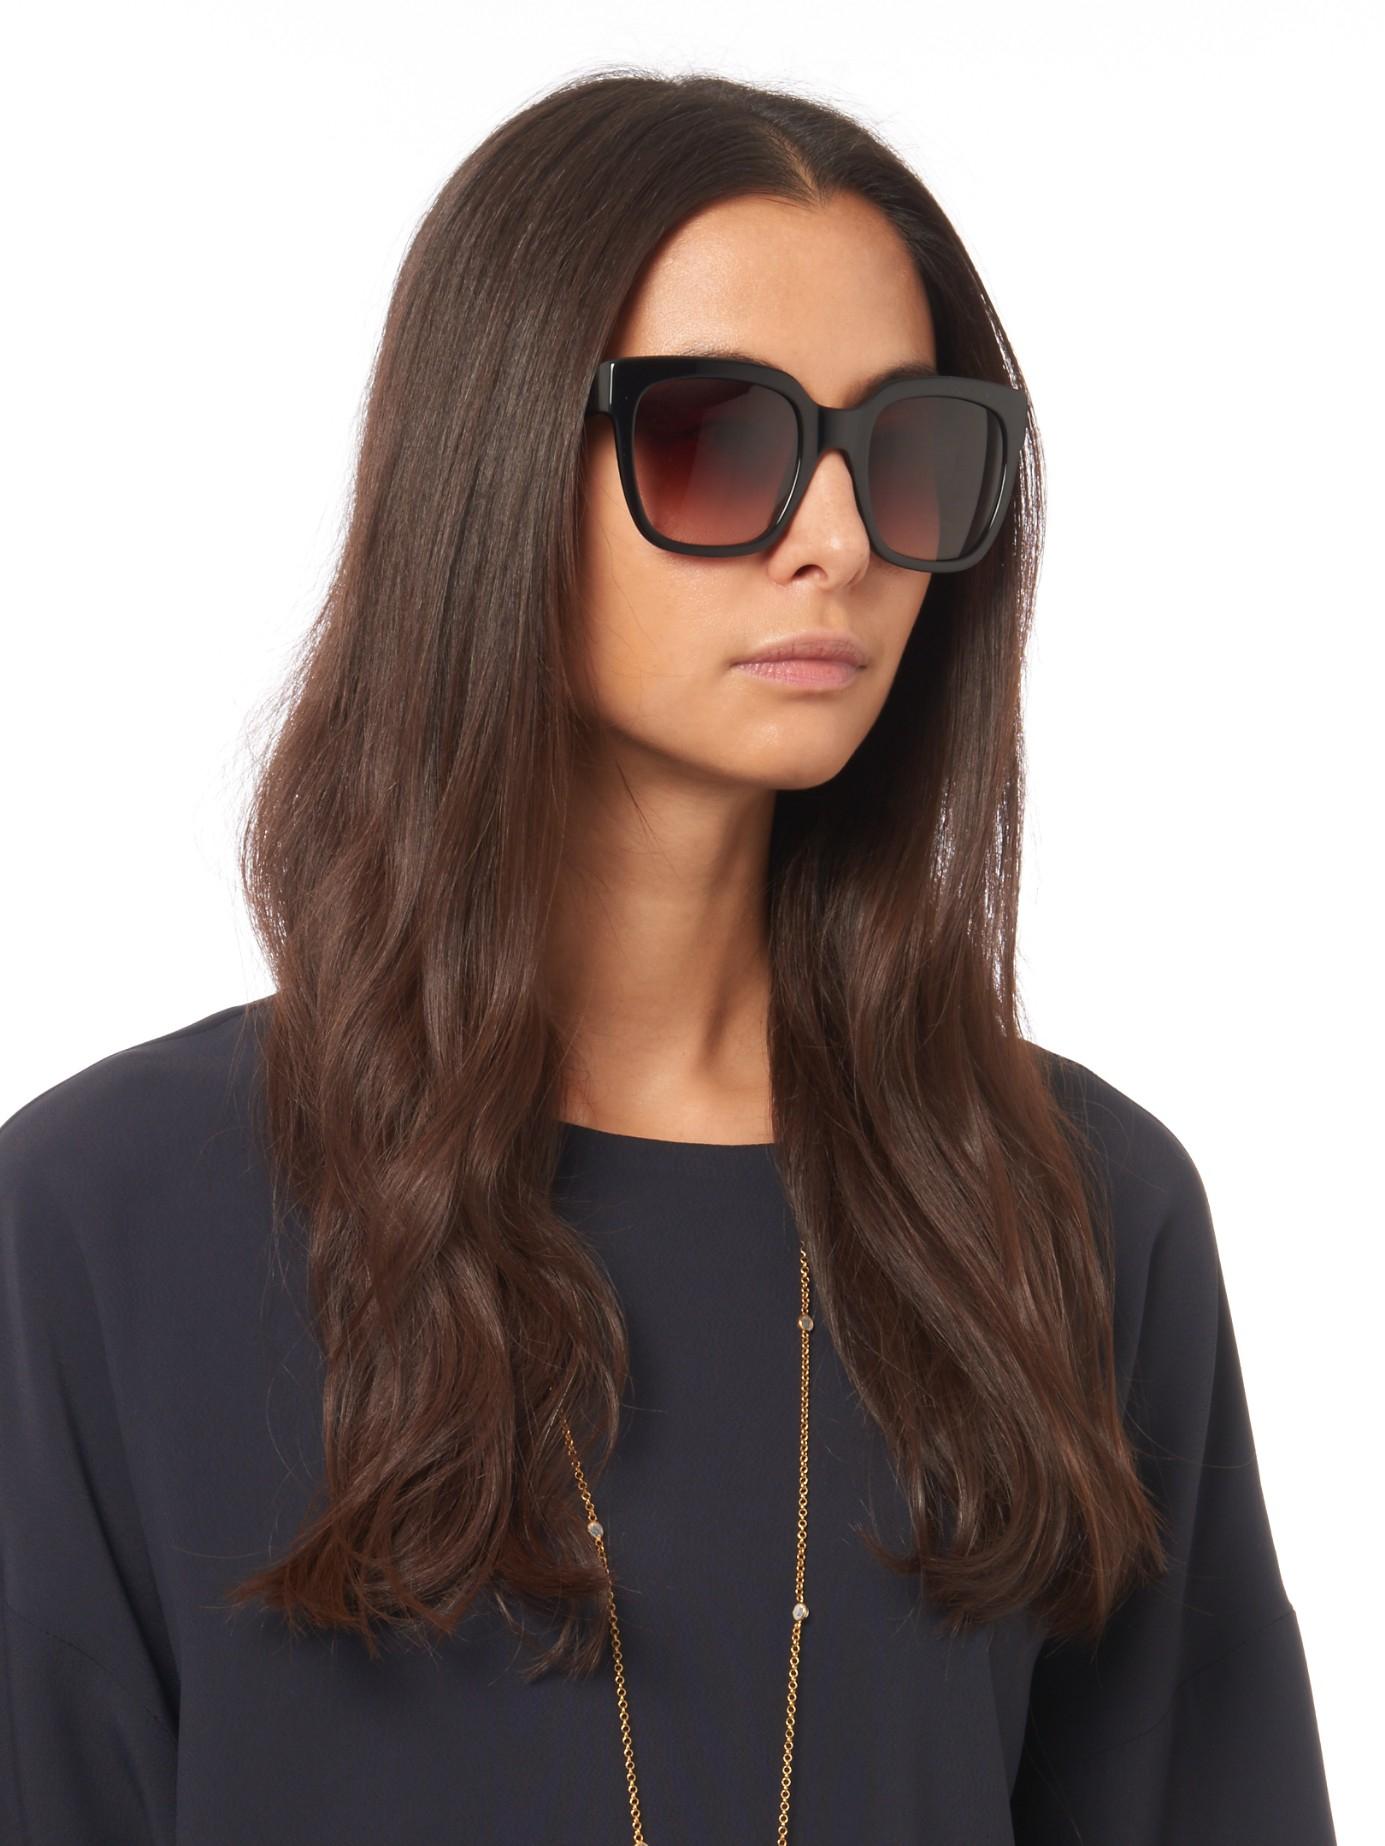 Max Mara Modern Sunglasses In Black Lyst